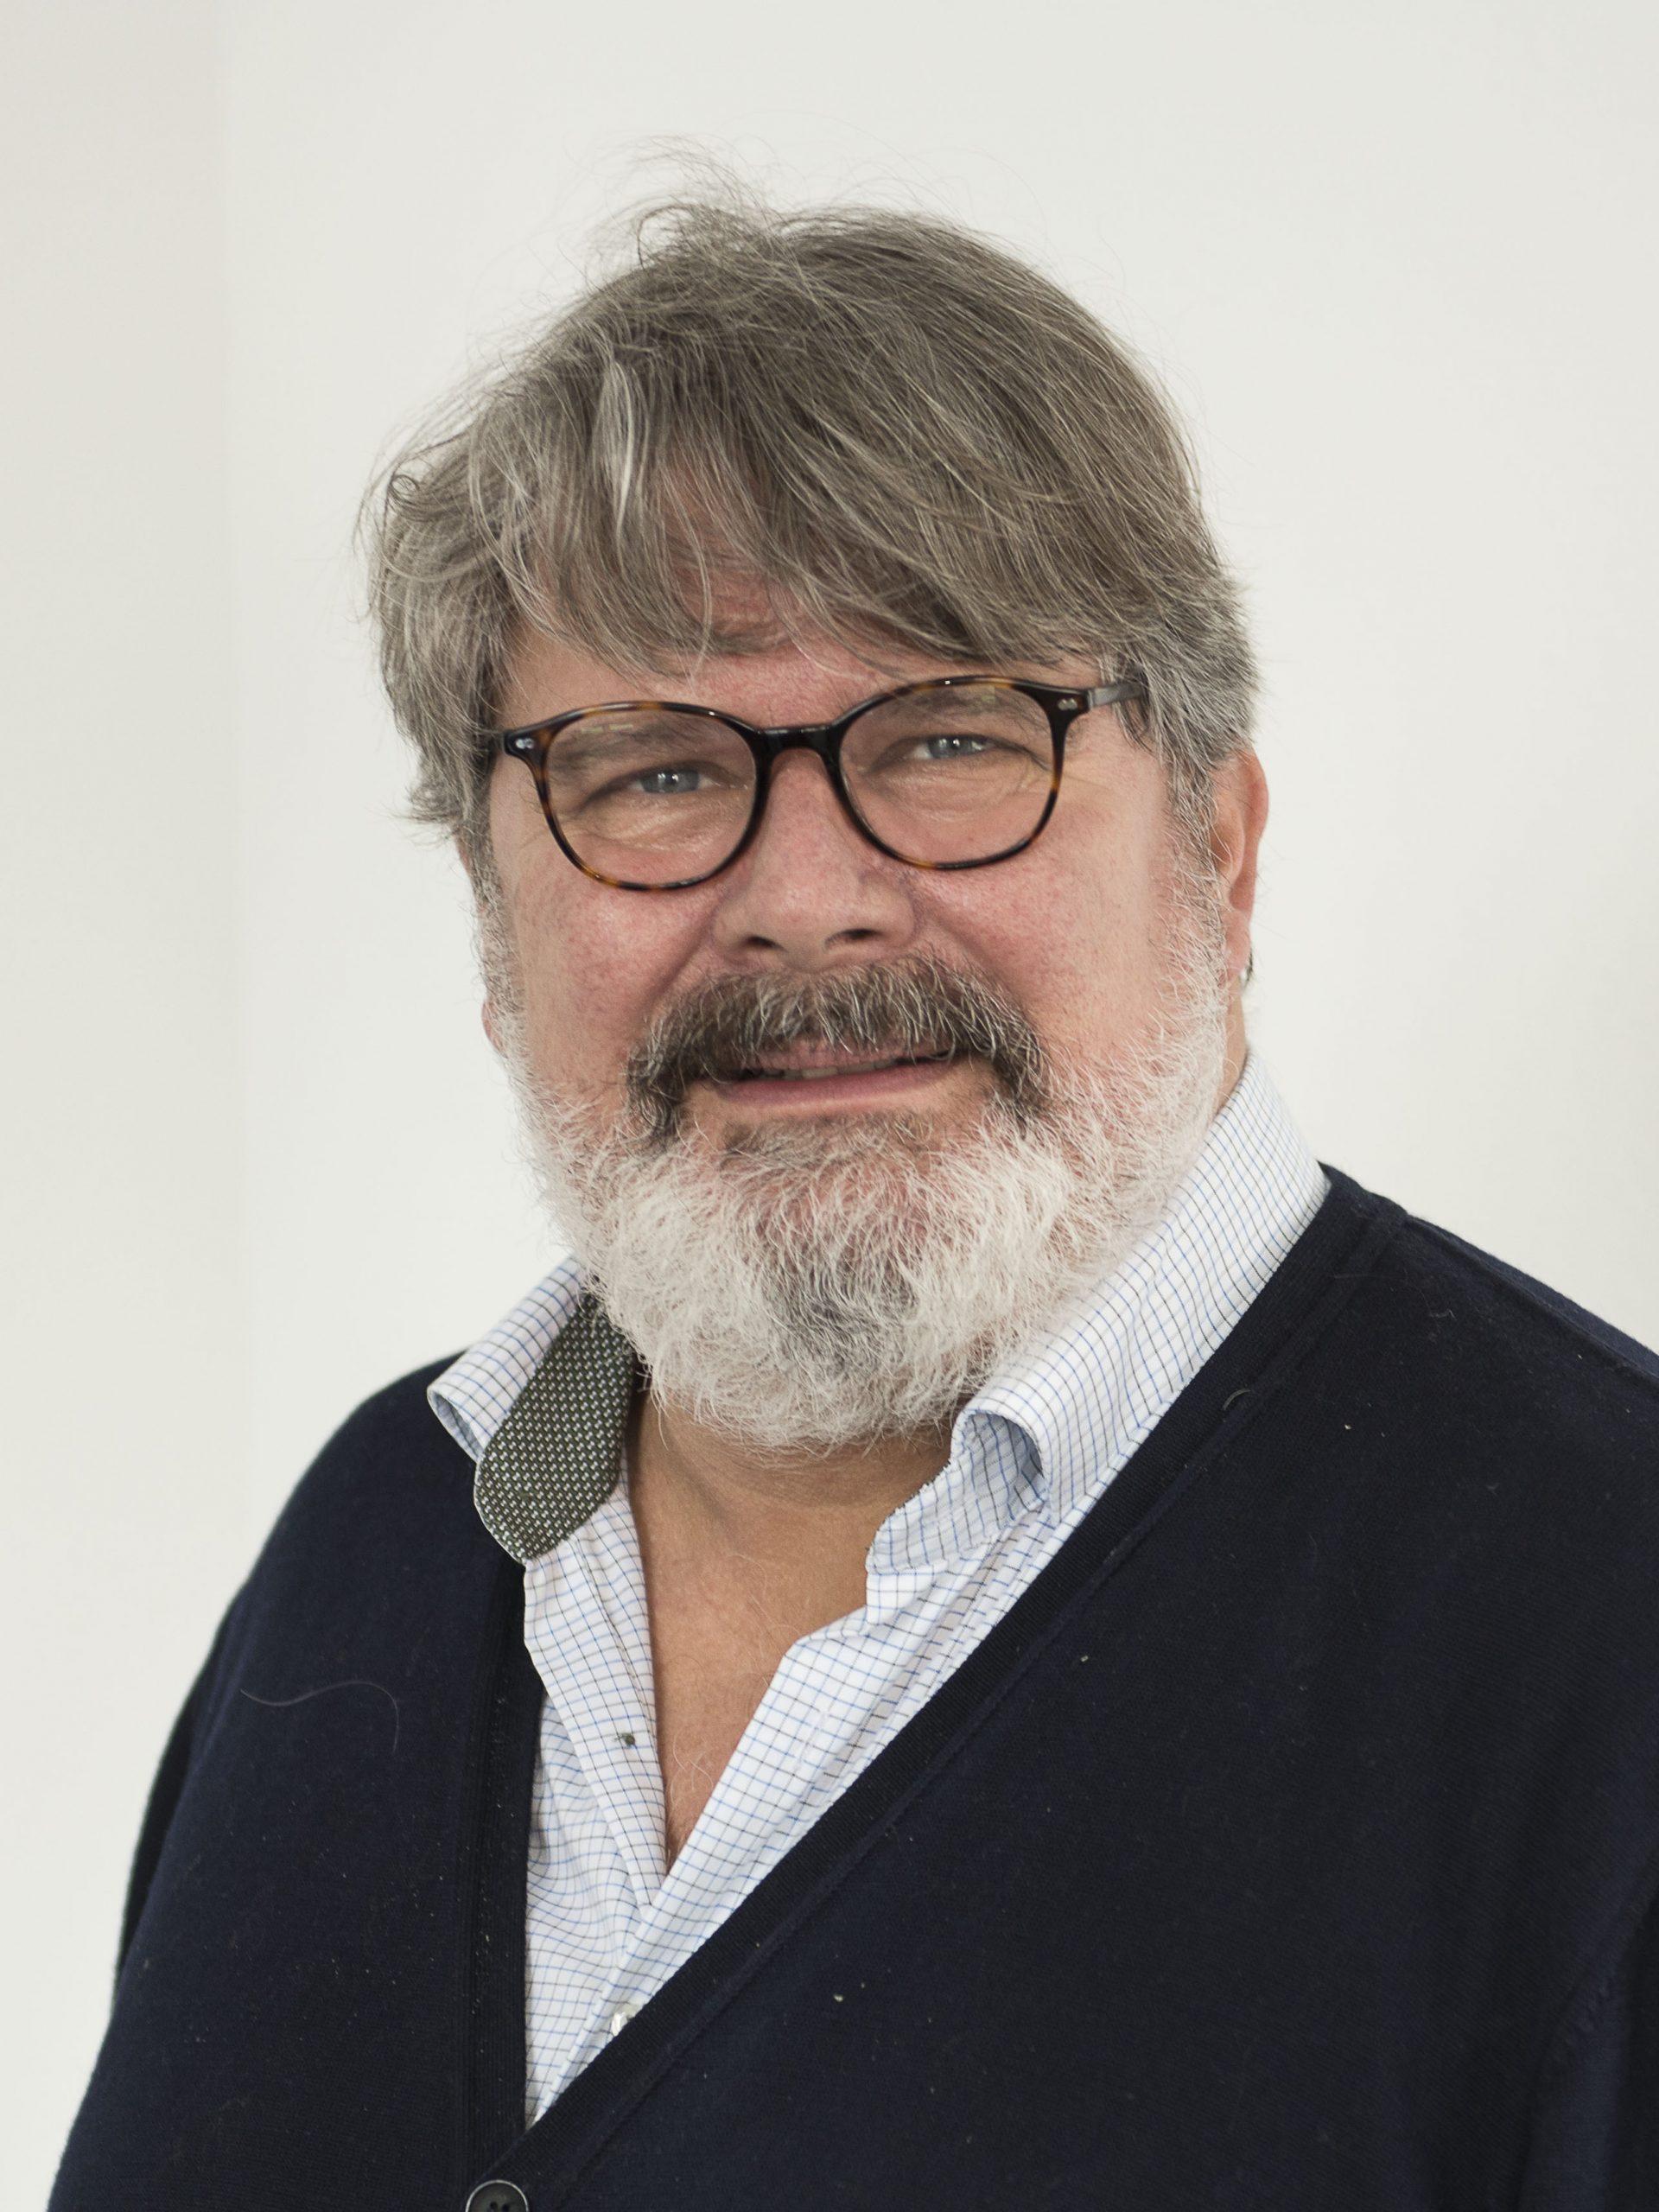 Frank Goedhart